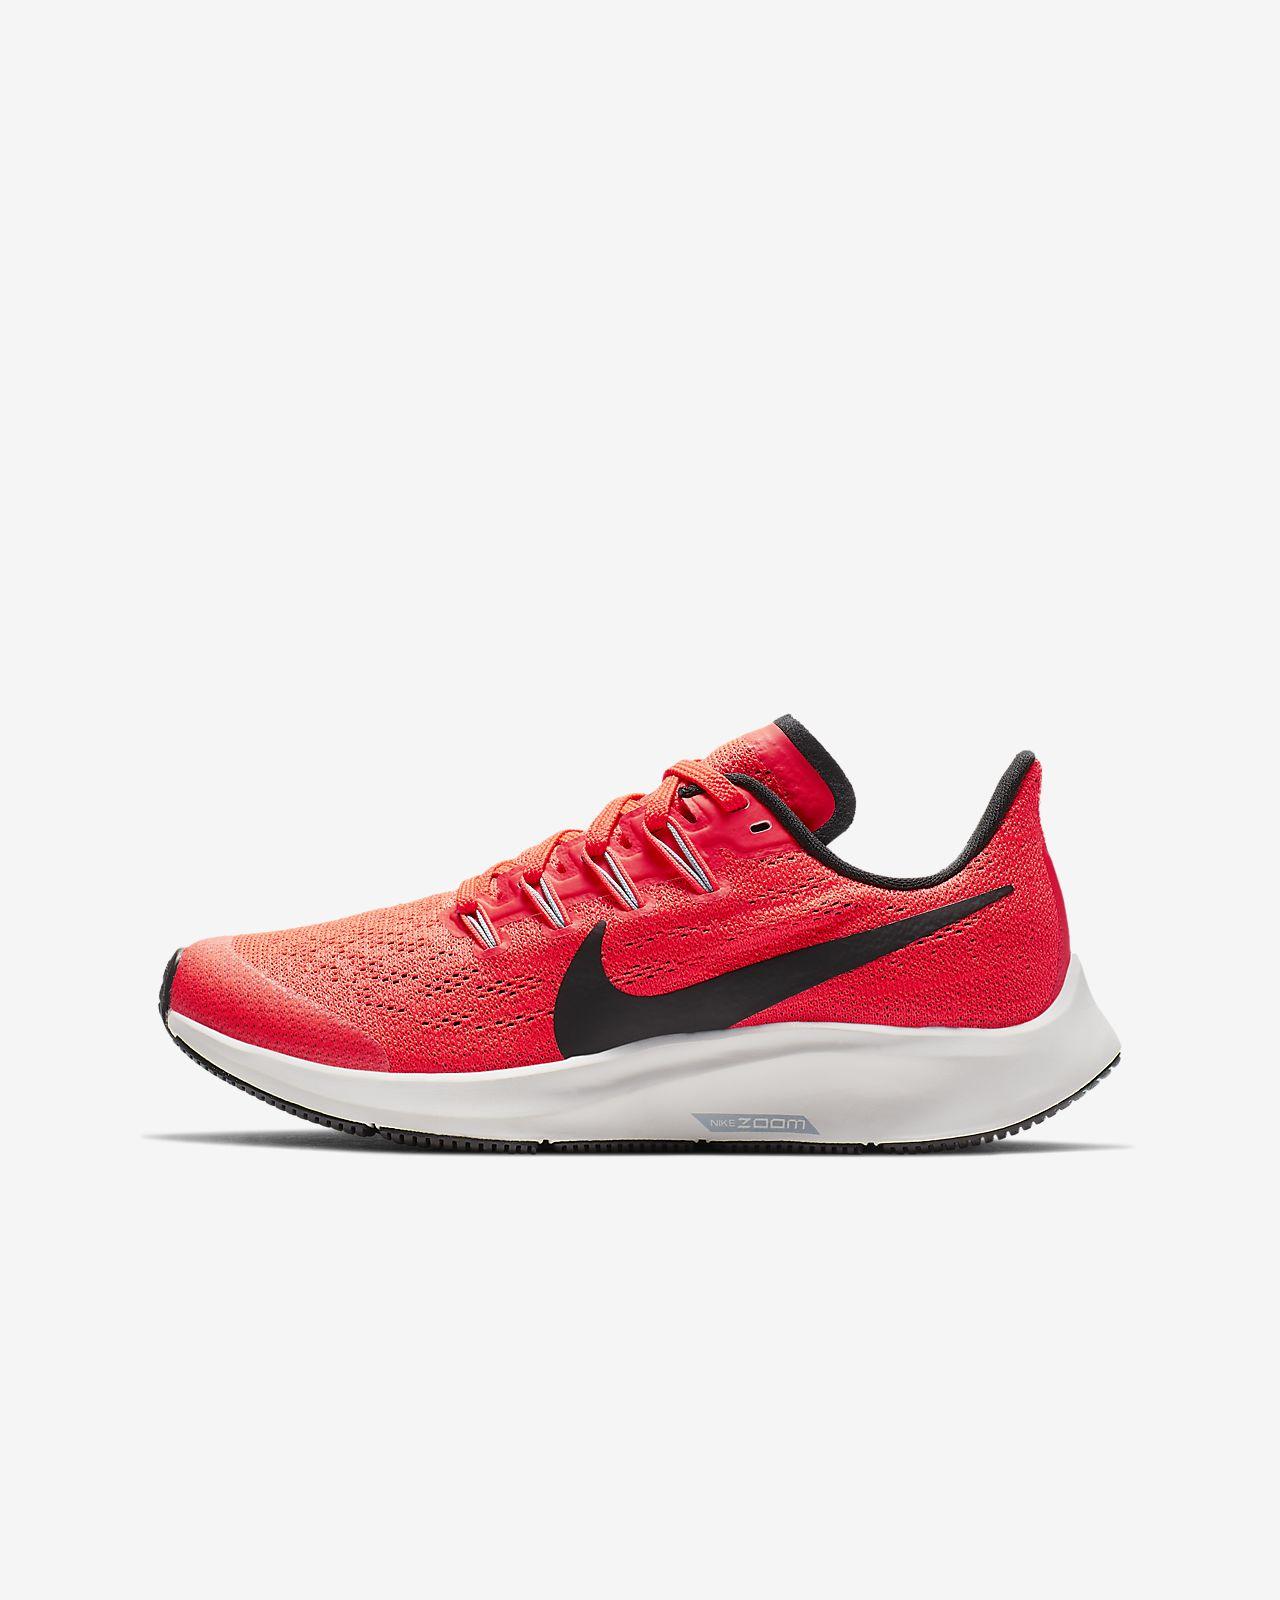 Calzado de running para niños talla pequeña/grande Nike Air Zoom Pegasus 36